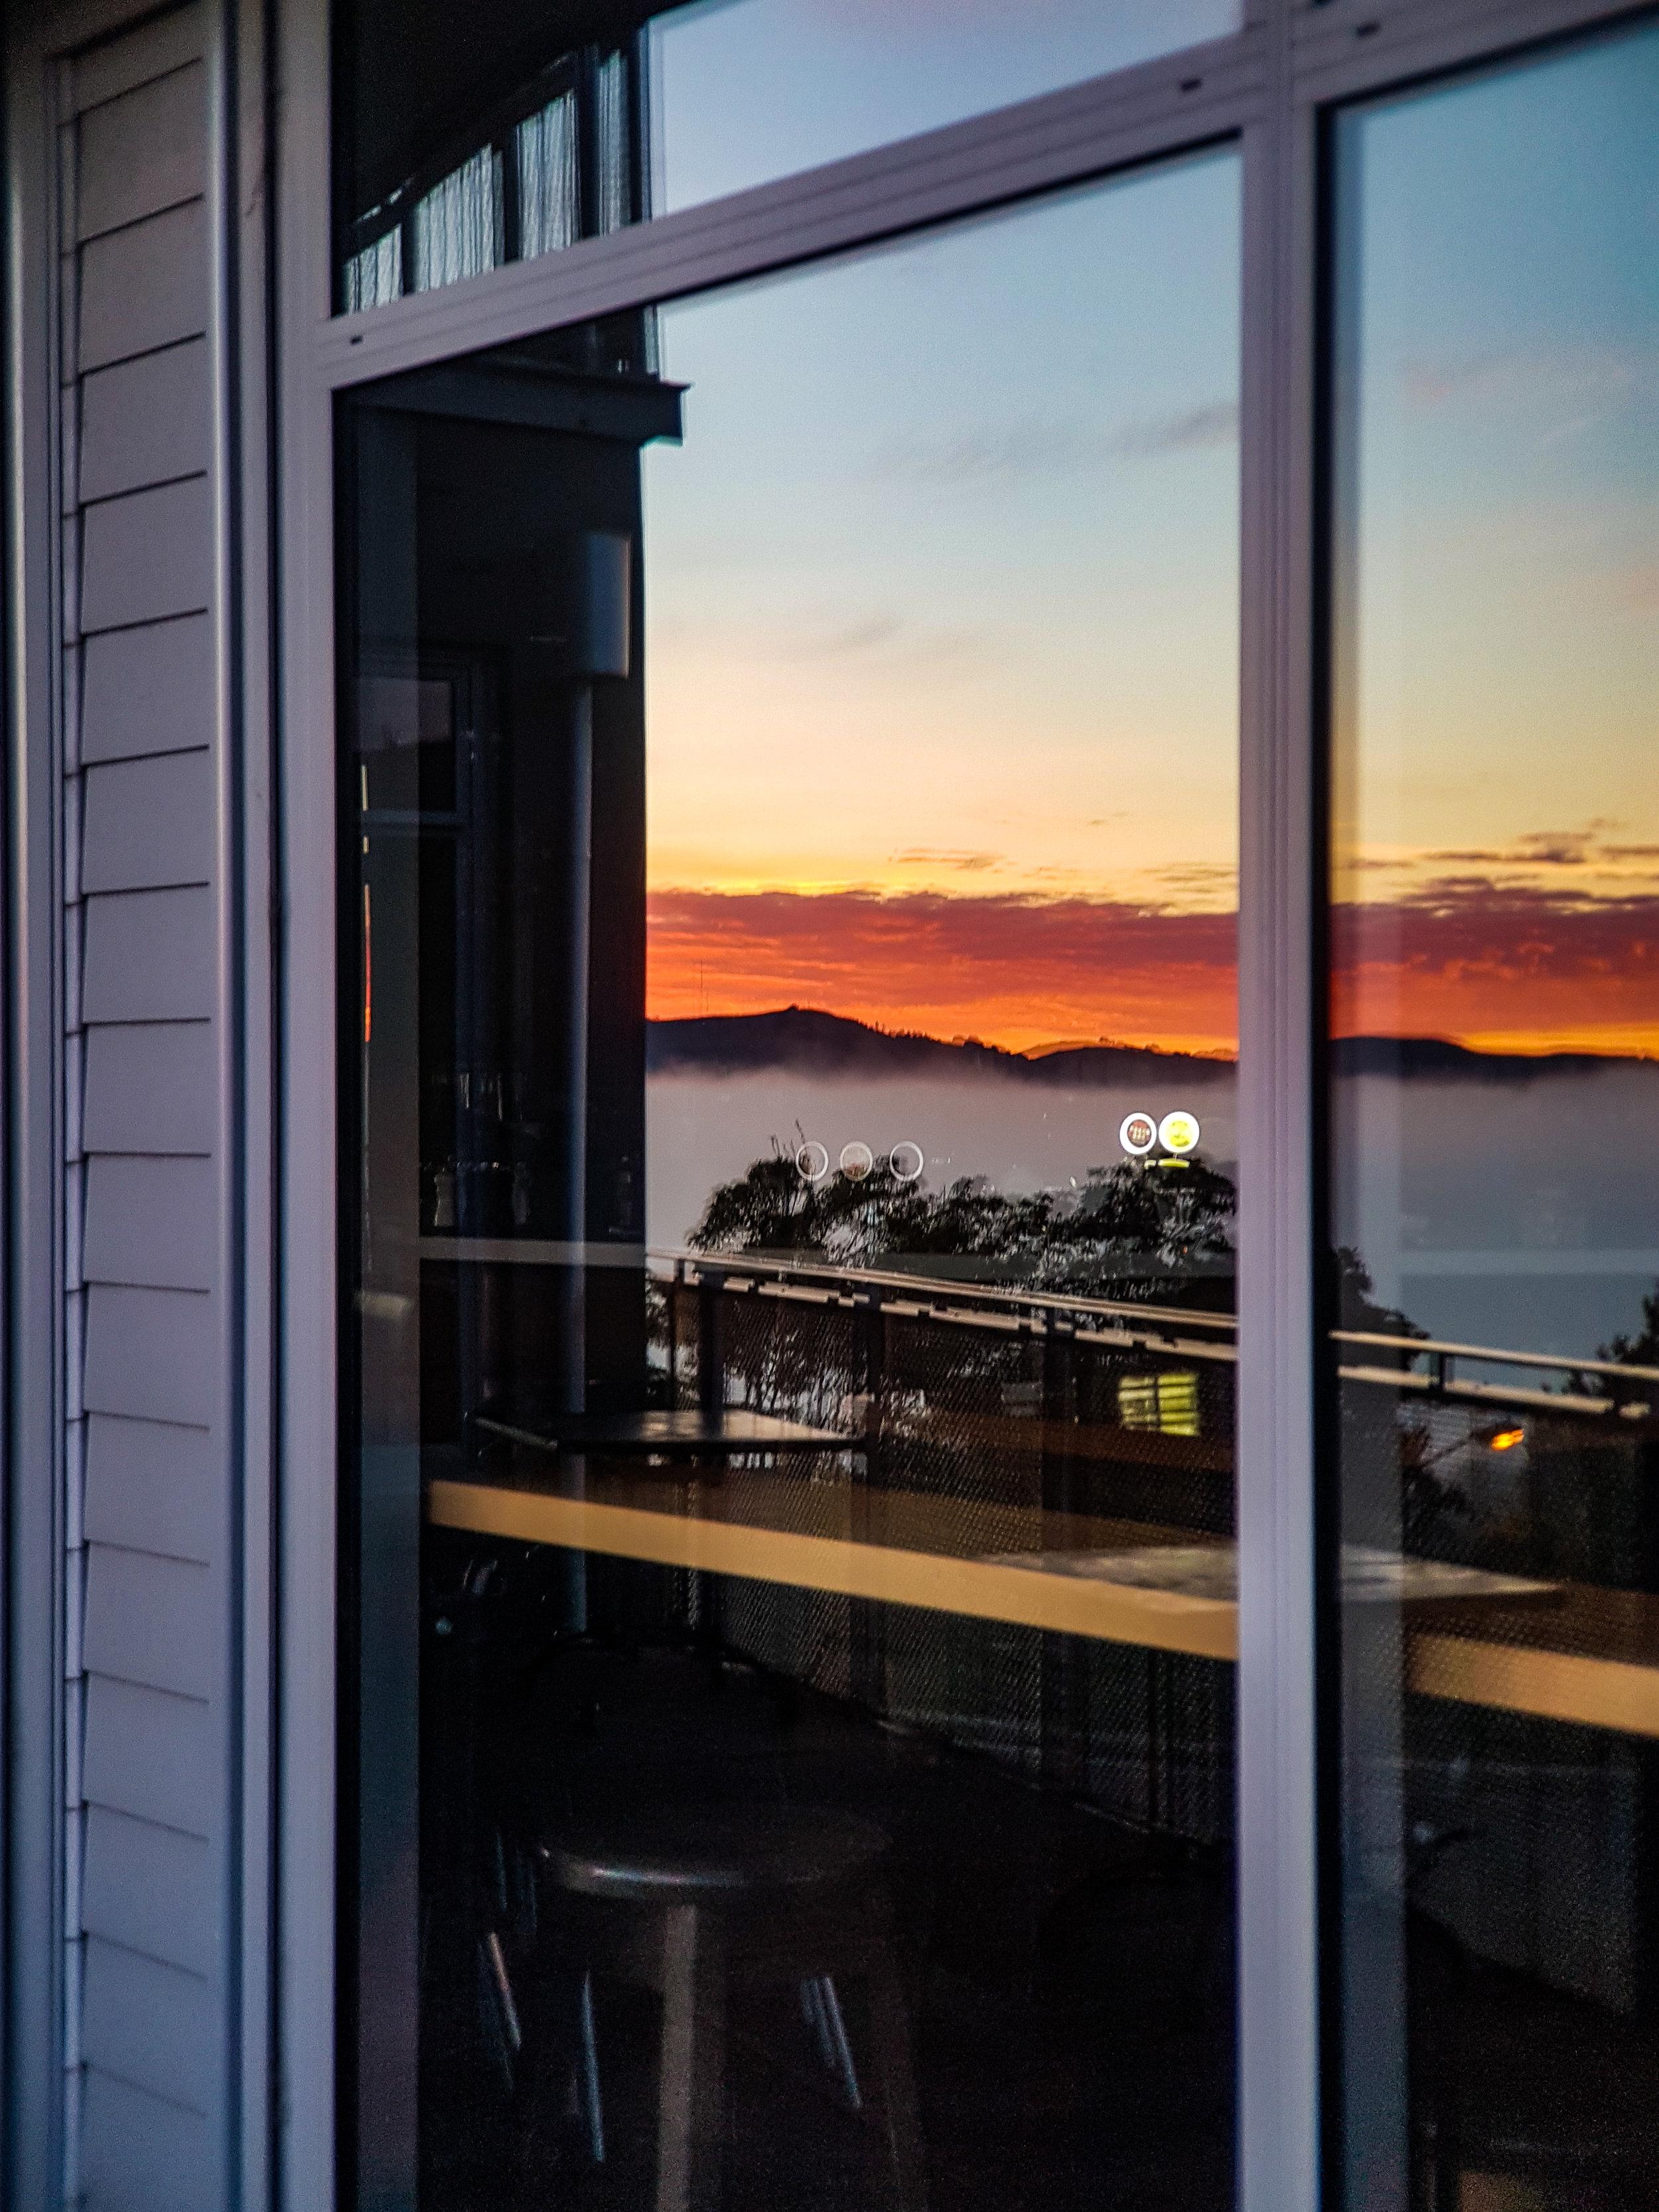 Luna bar Dunedin table in a window